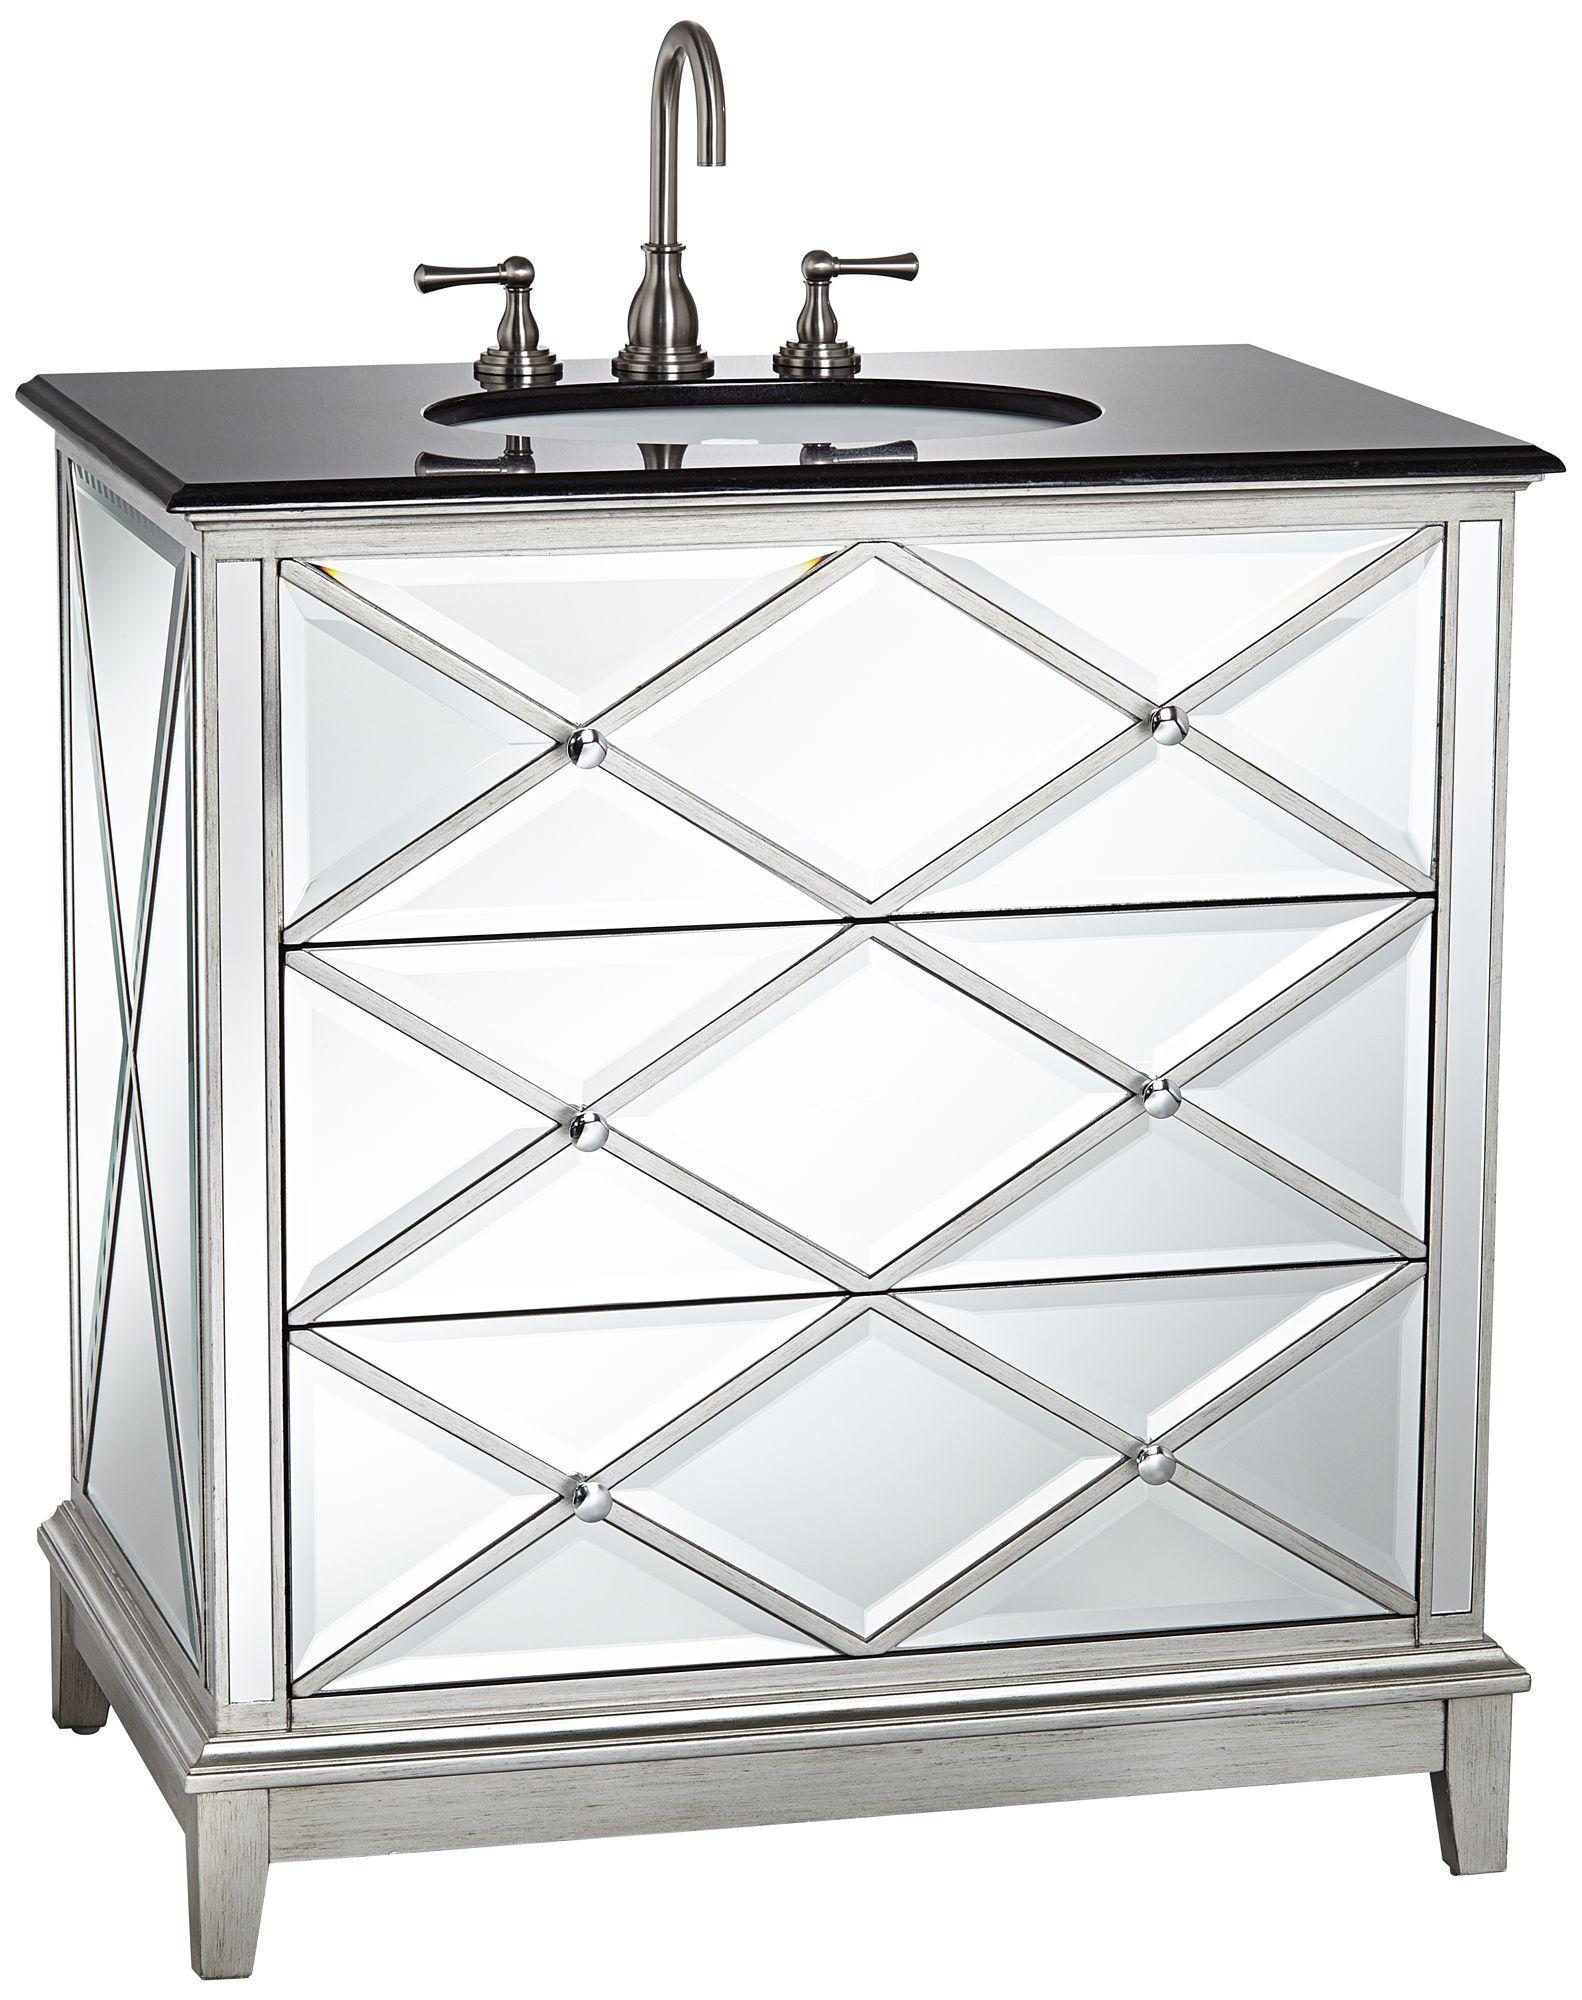 Delightful Criss Cross Mirrored Single Sink Vanity